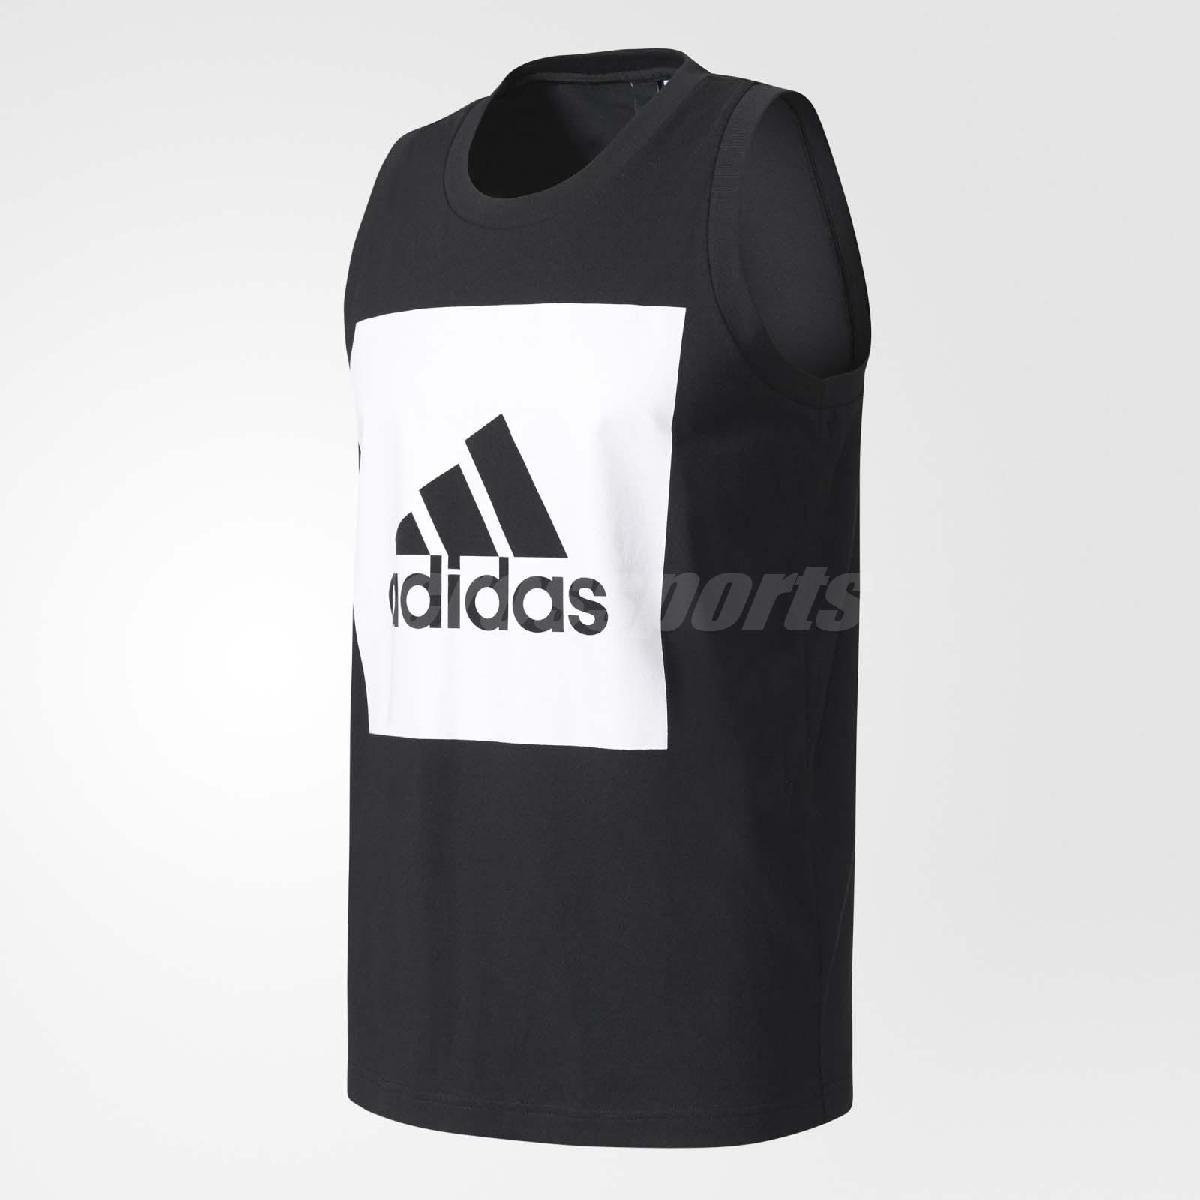 adidas 背心 Essential Tank 男款 大Logo 三條線 球衣 無袖 圓領 上衣 吊嘎 基本款 黑白 【PUMP306】 B47364